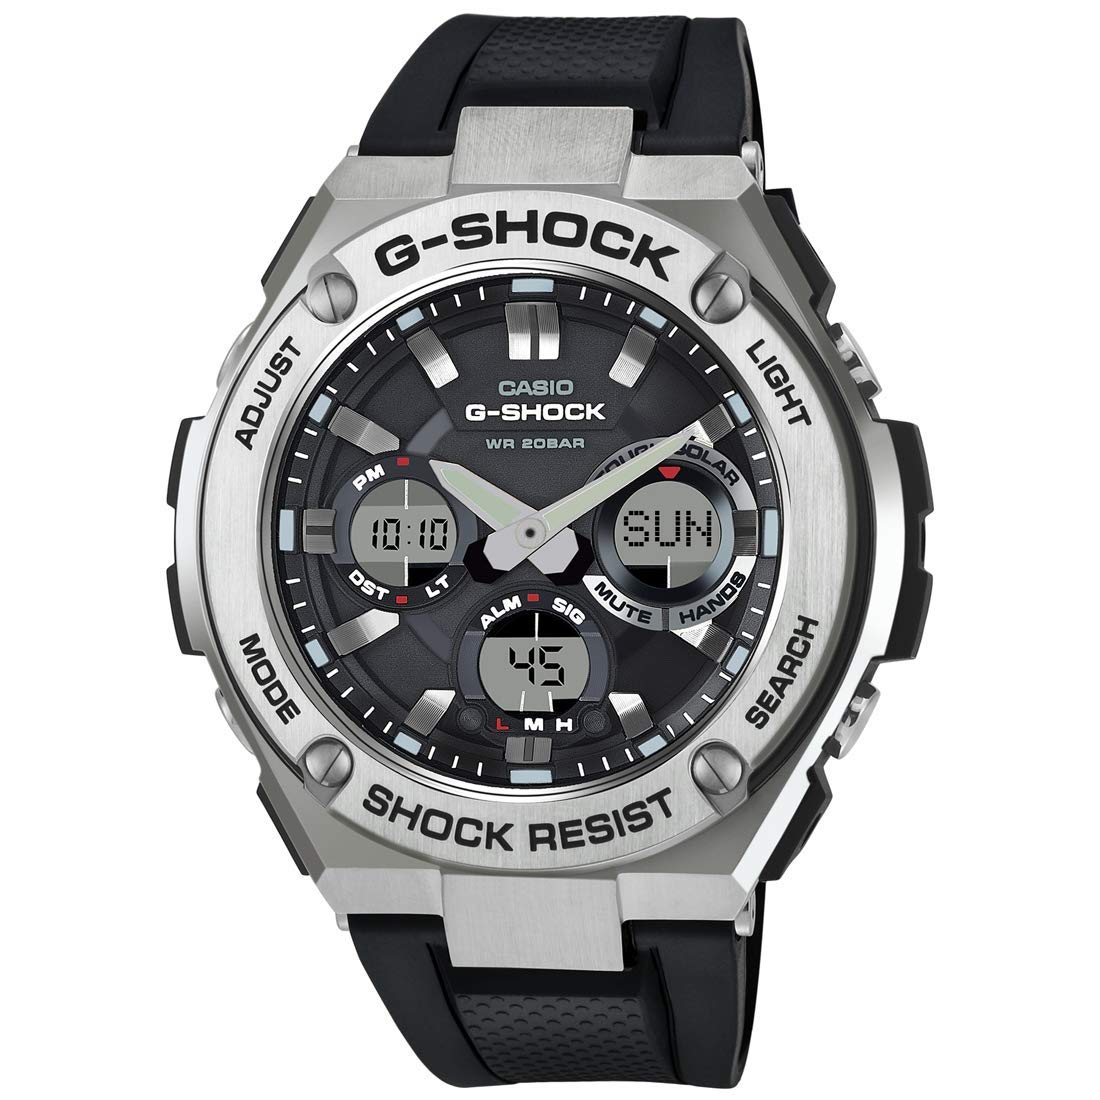 Men's G Shock Stainless Steel Quartz Watch with Resin Strap, Black, 26.8 (Model: GST-S110-1ACR)